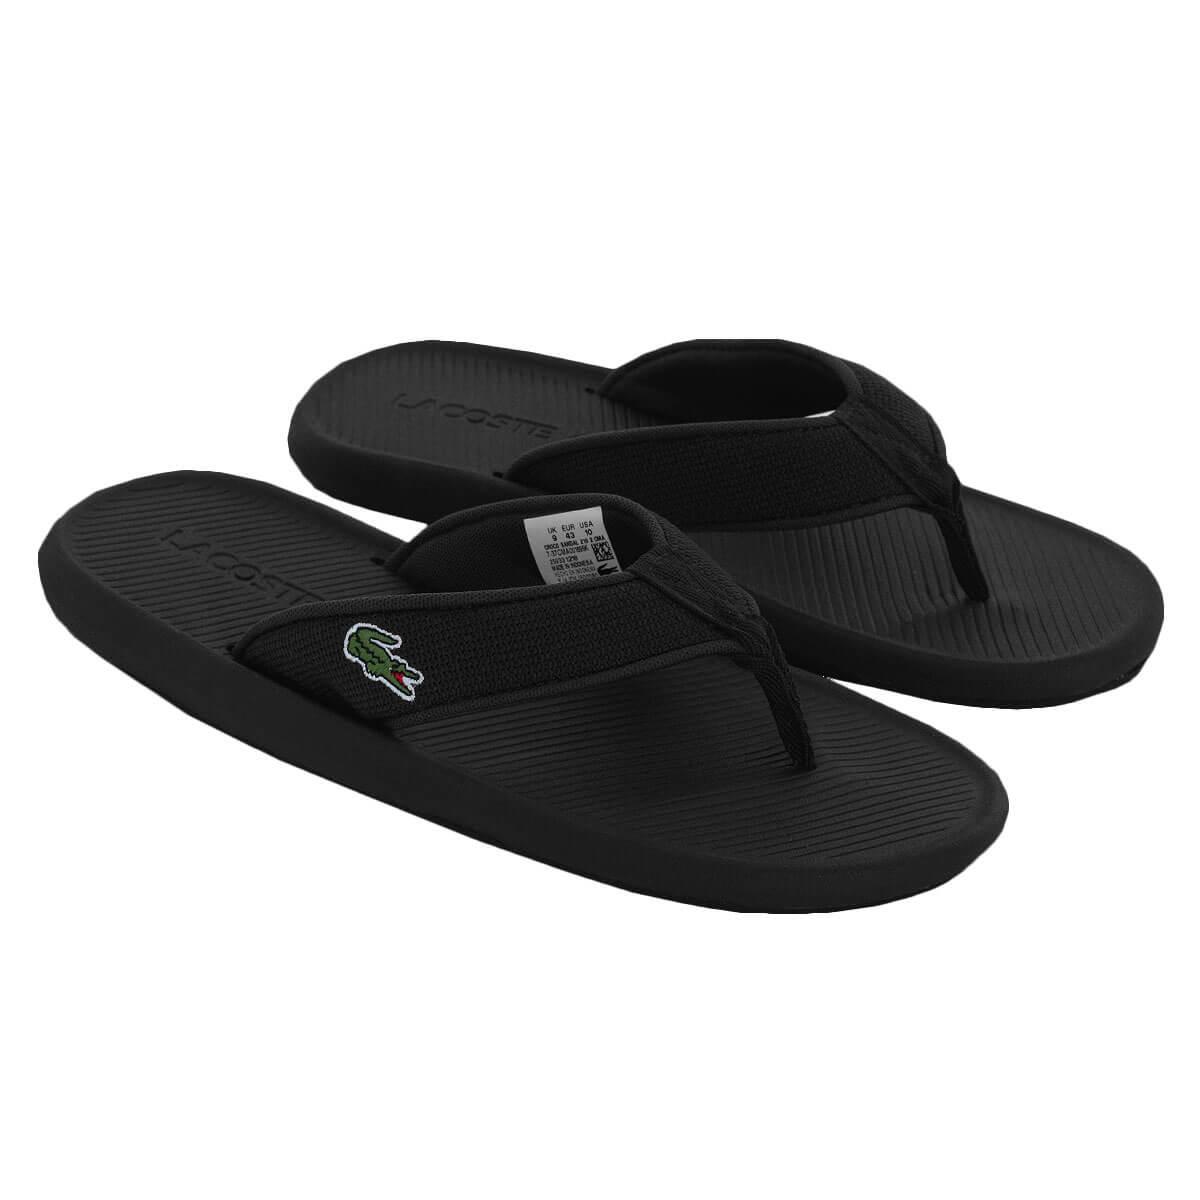 7174f1a22 Lacoste Men s Croco Sandal 219 2 CMA Flip Flops